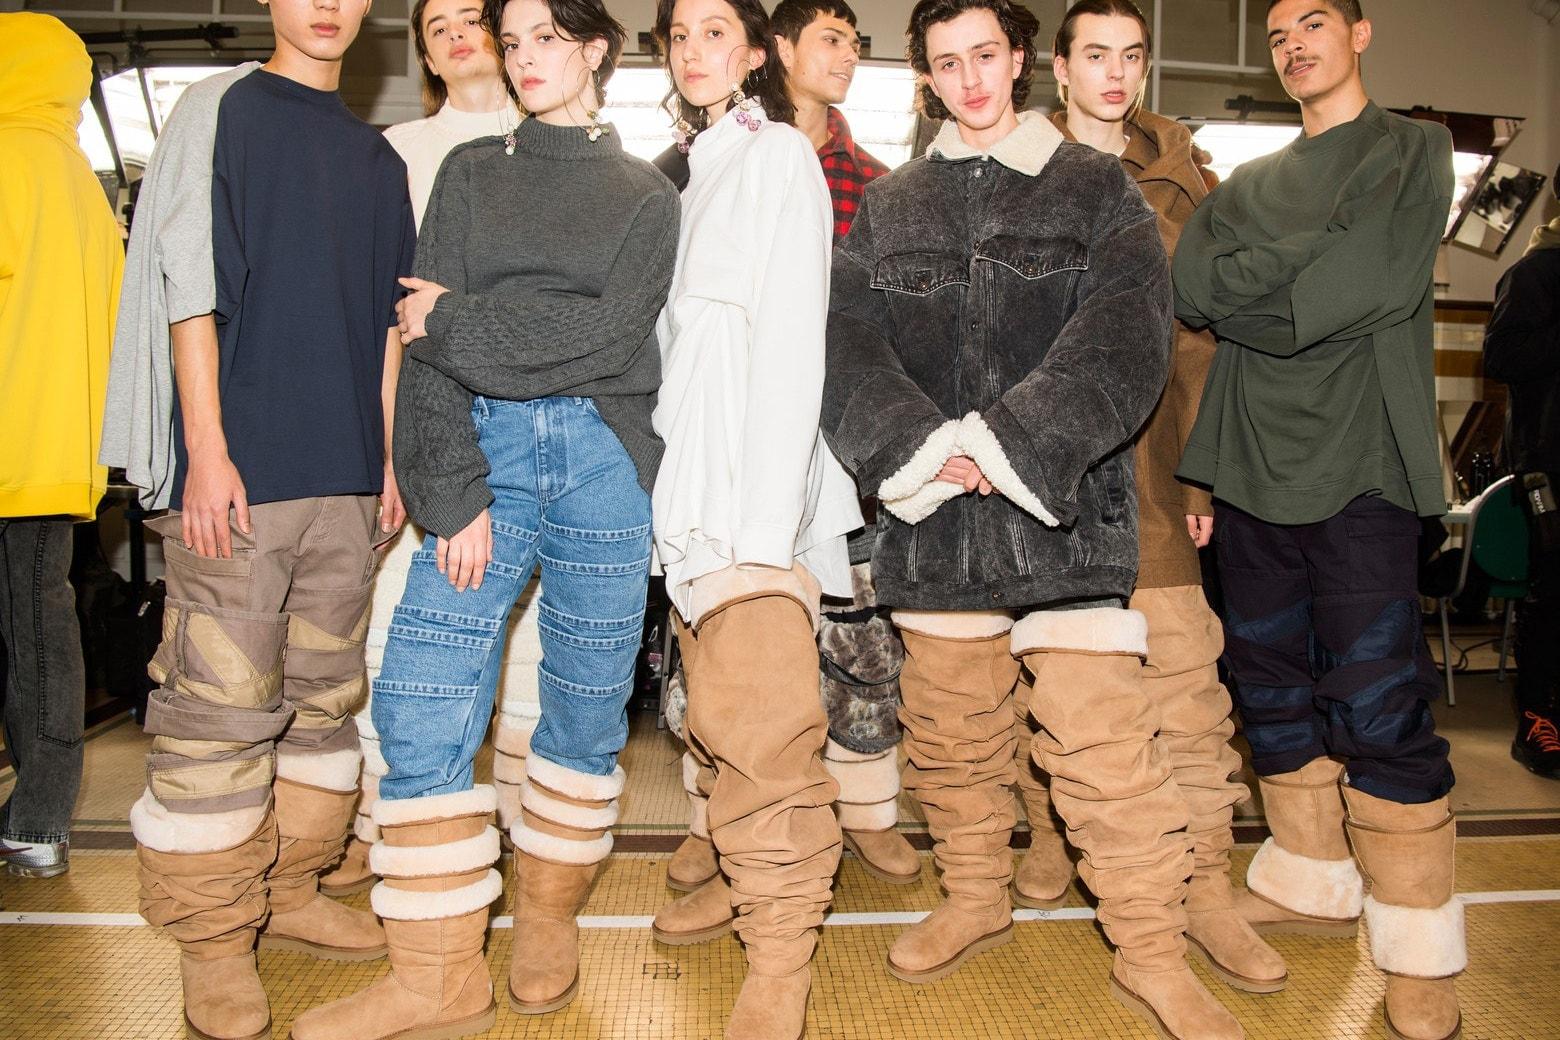 UGG Boots Sacai Chitose Abe Y Project Paris Fashion Week Mens Jeremy Scott Collaboration Basic Aleali May Streetwear